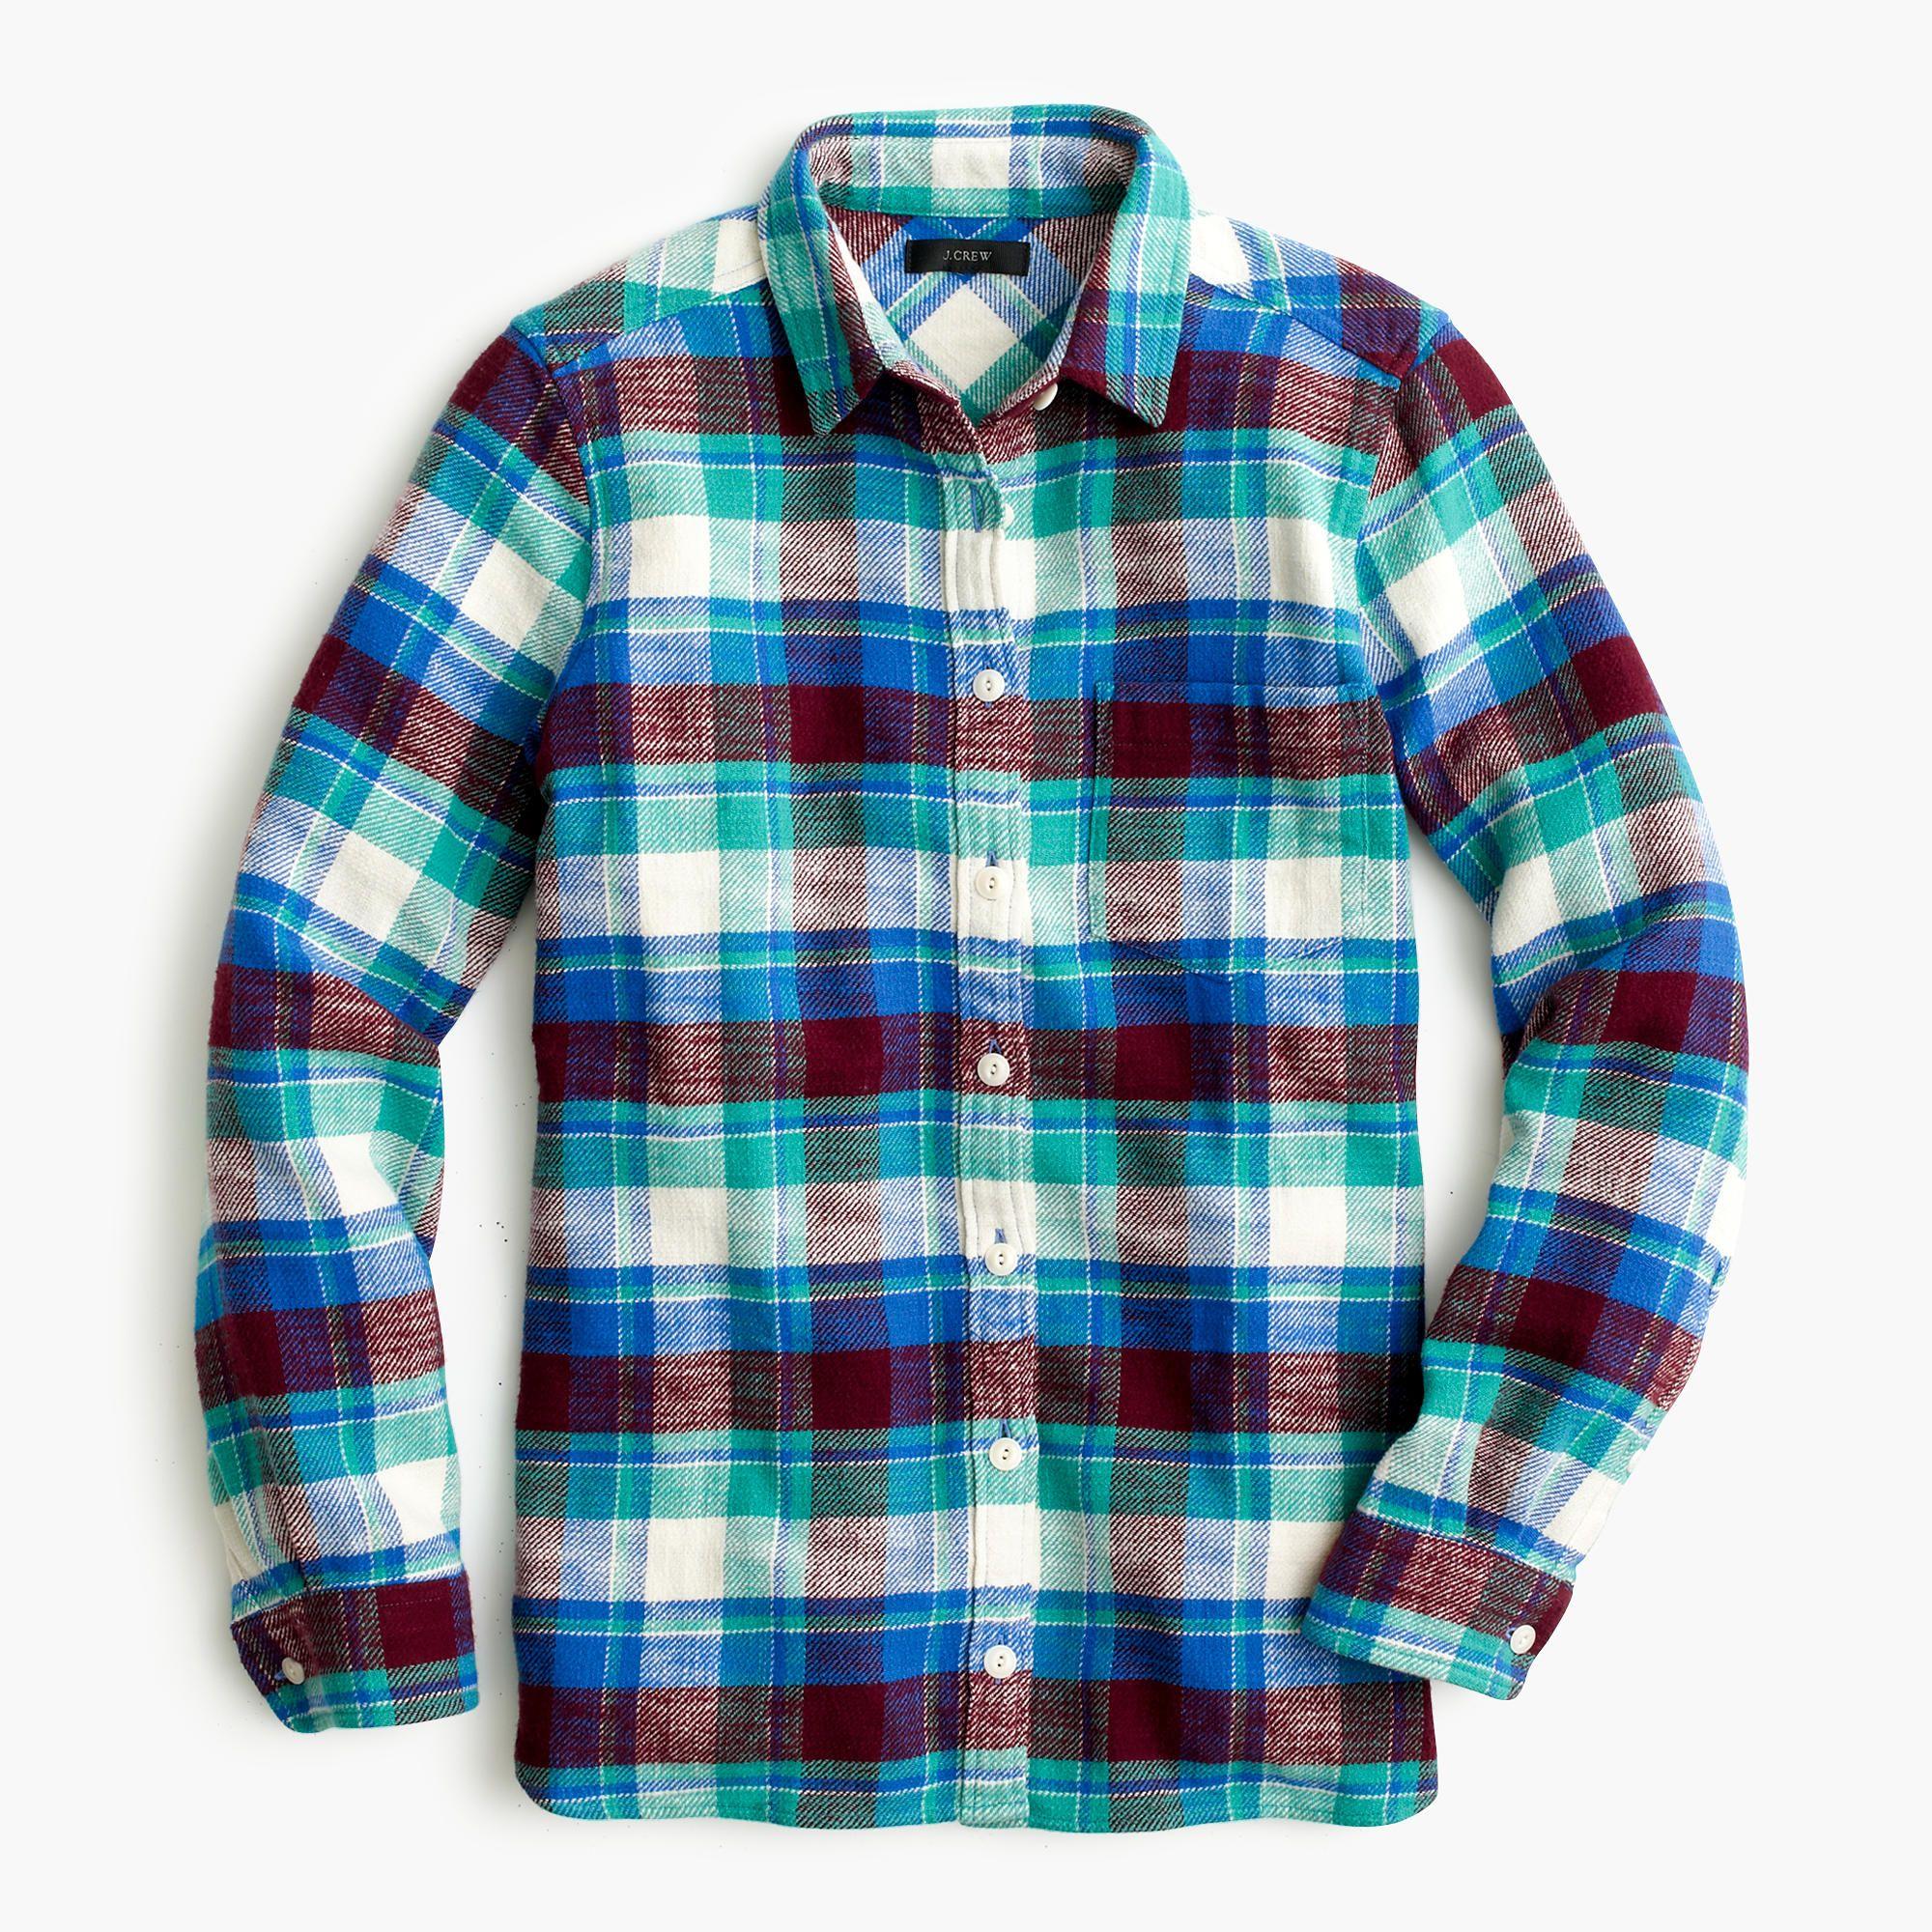 9a9a4f7a Shrunken boy shirt in gemstone plaid : shirts & tops | J.Crew | J ...